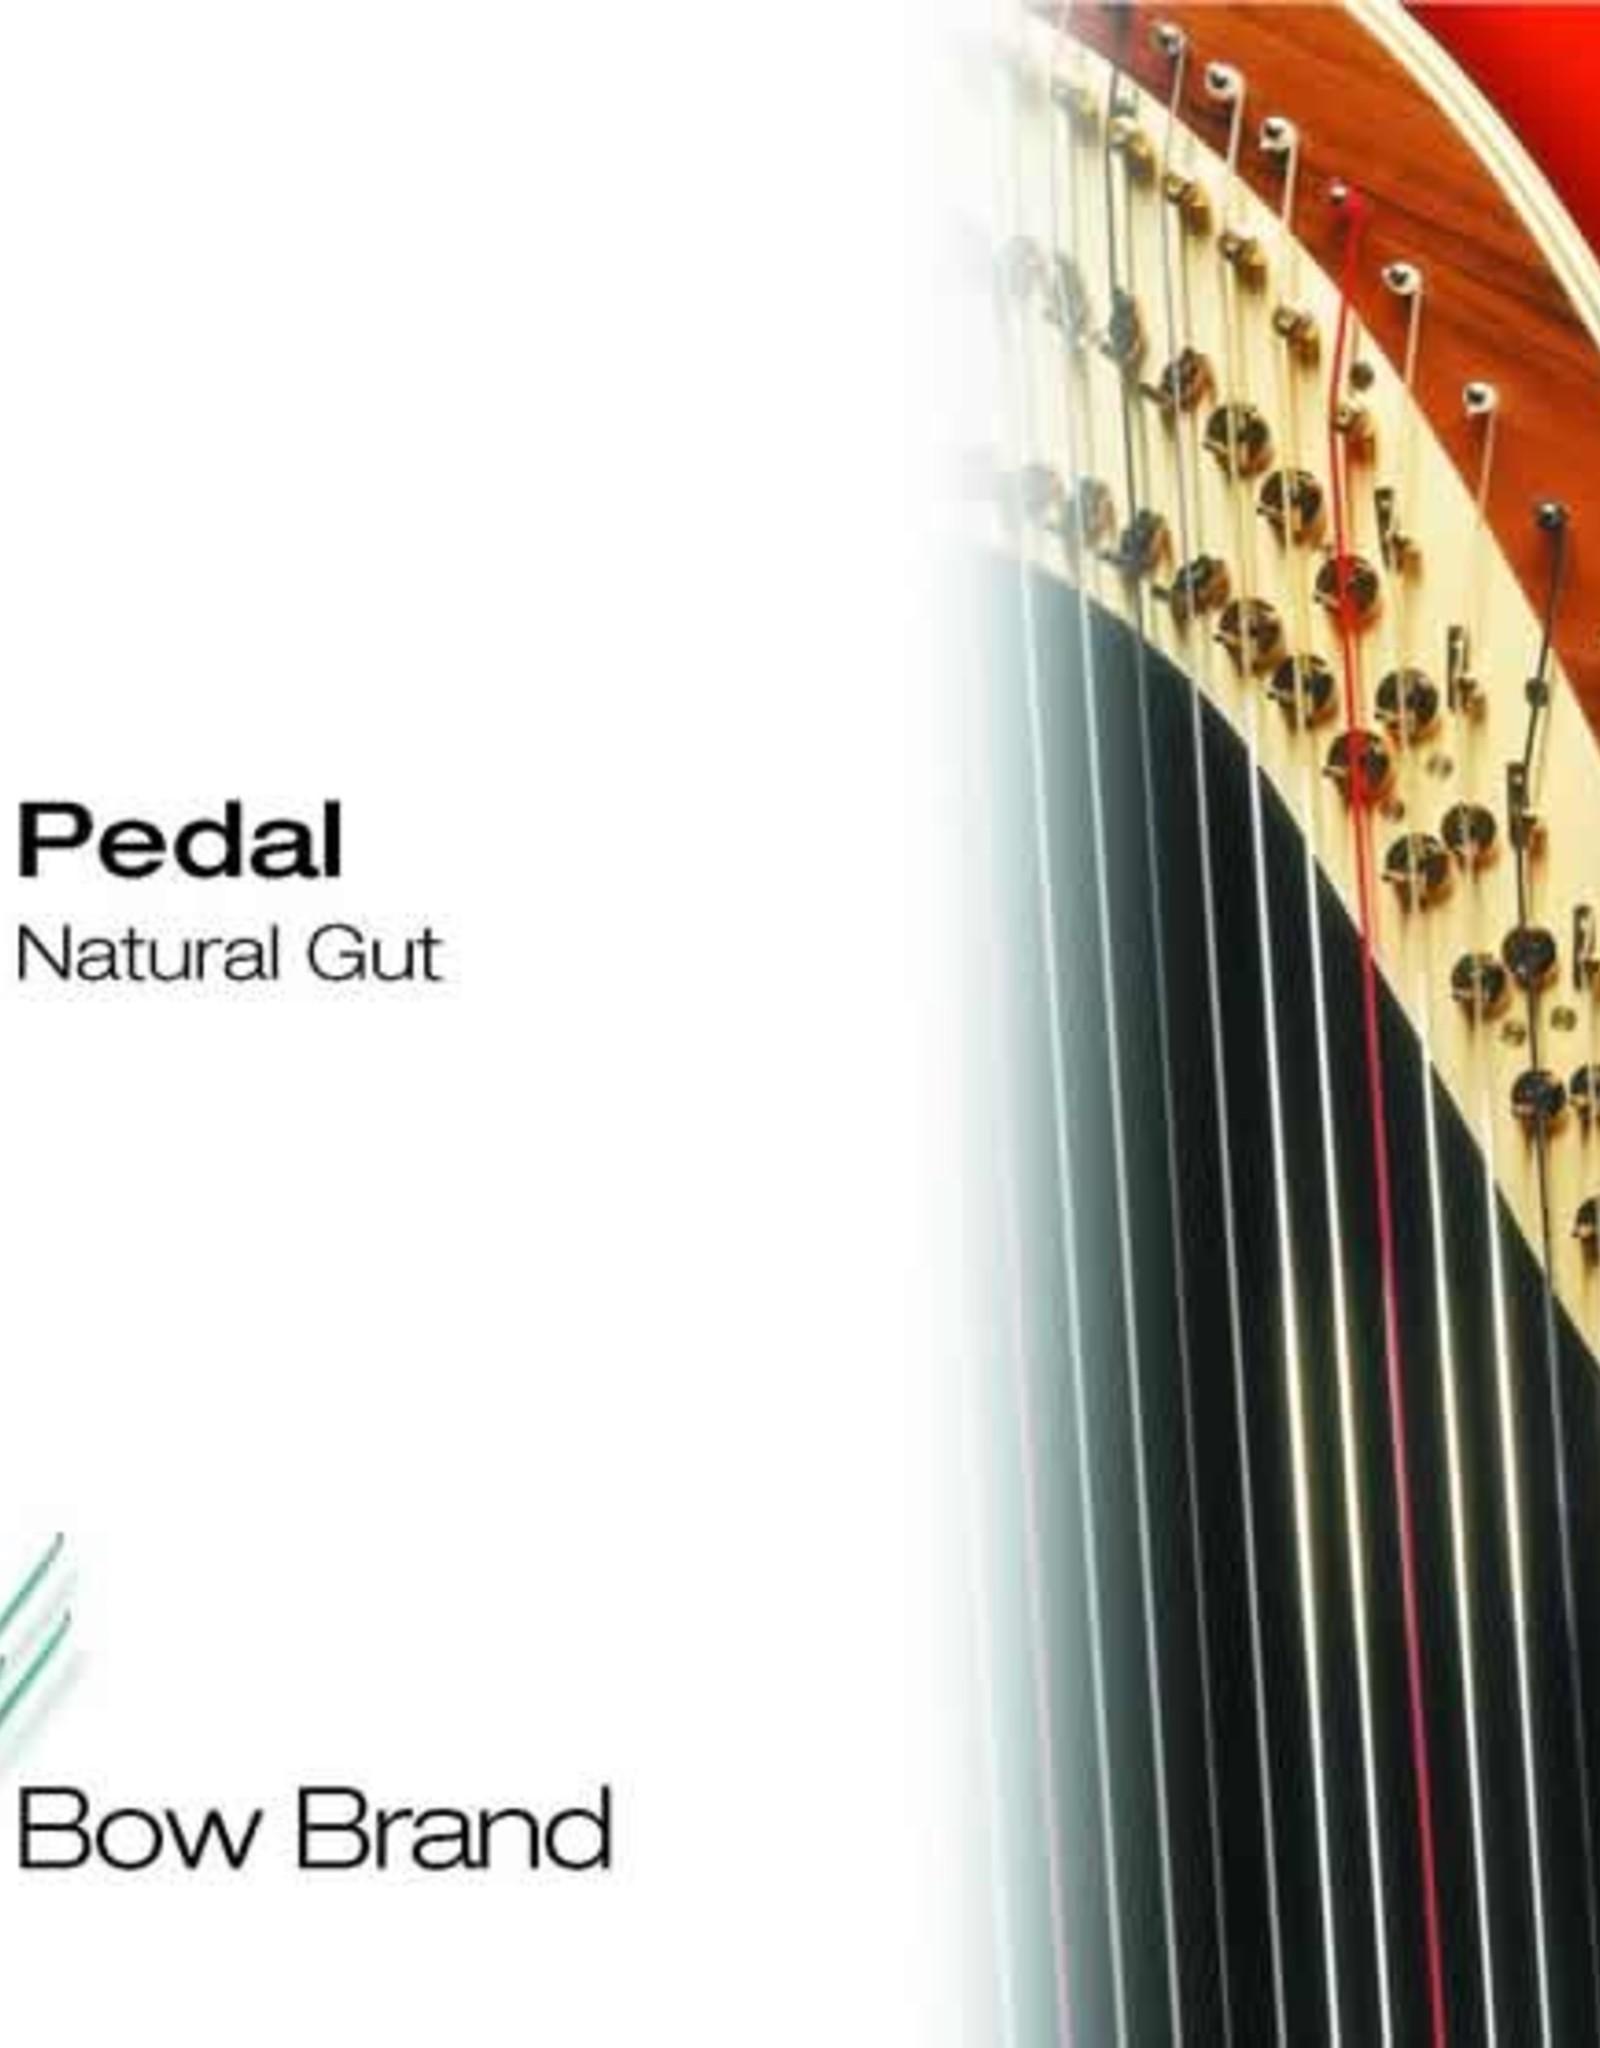 BOW BRAND  pedaal darm - pedal STD GUT 7/1 fa